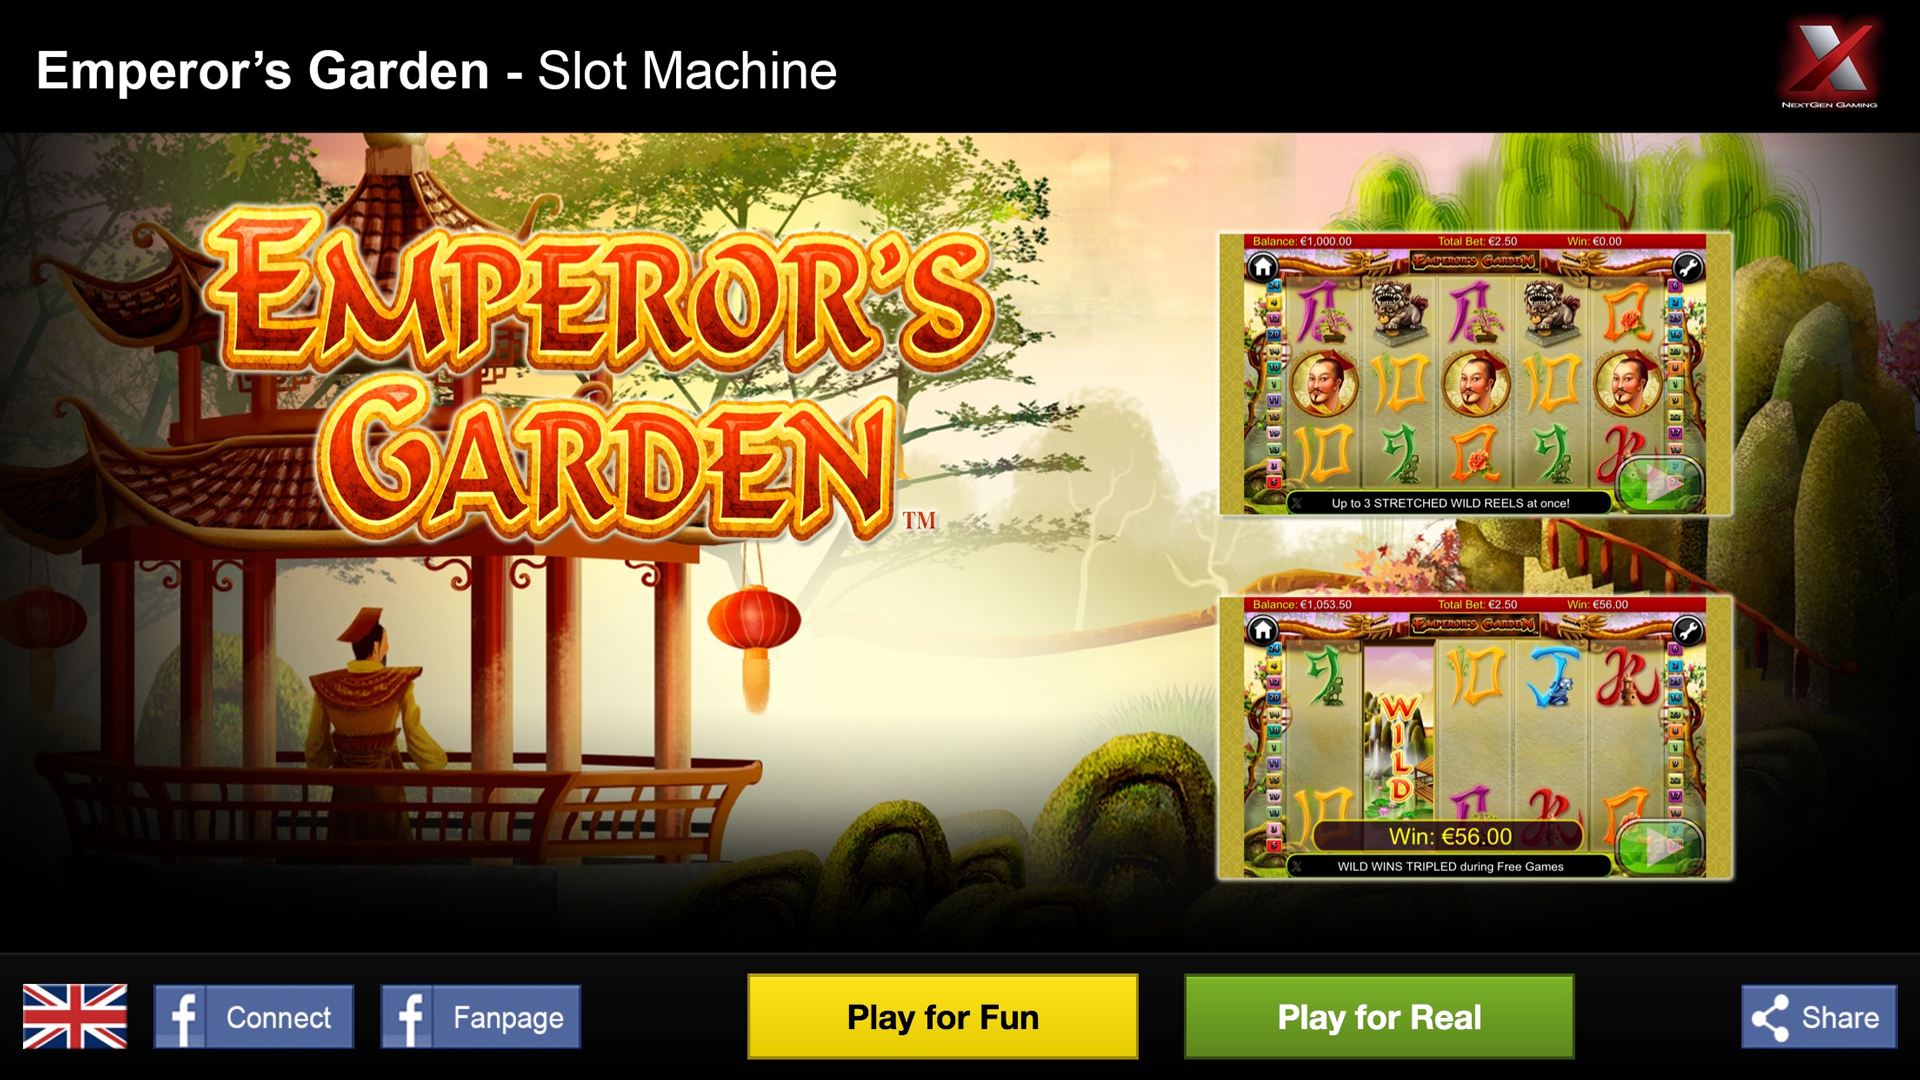 Emperor's Garden Slot Machine